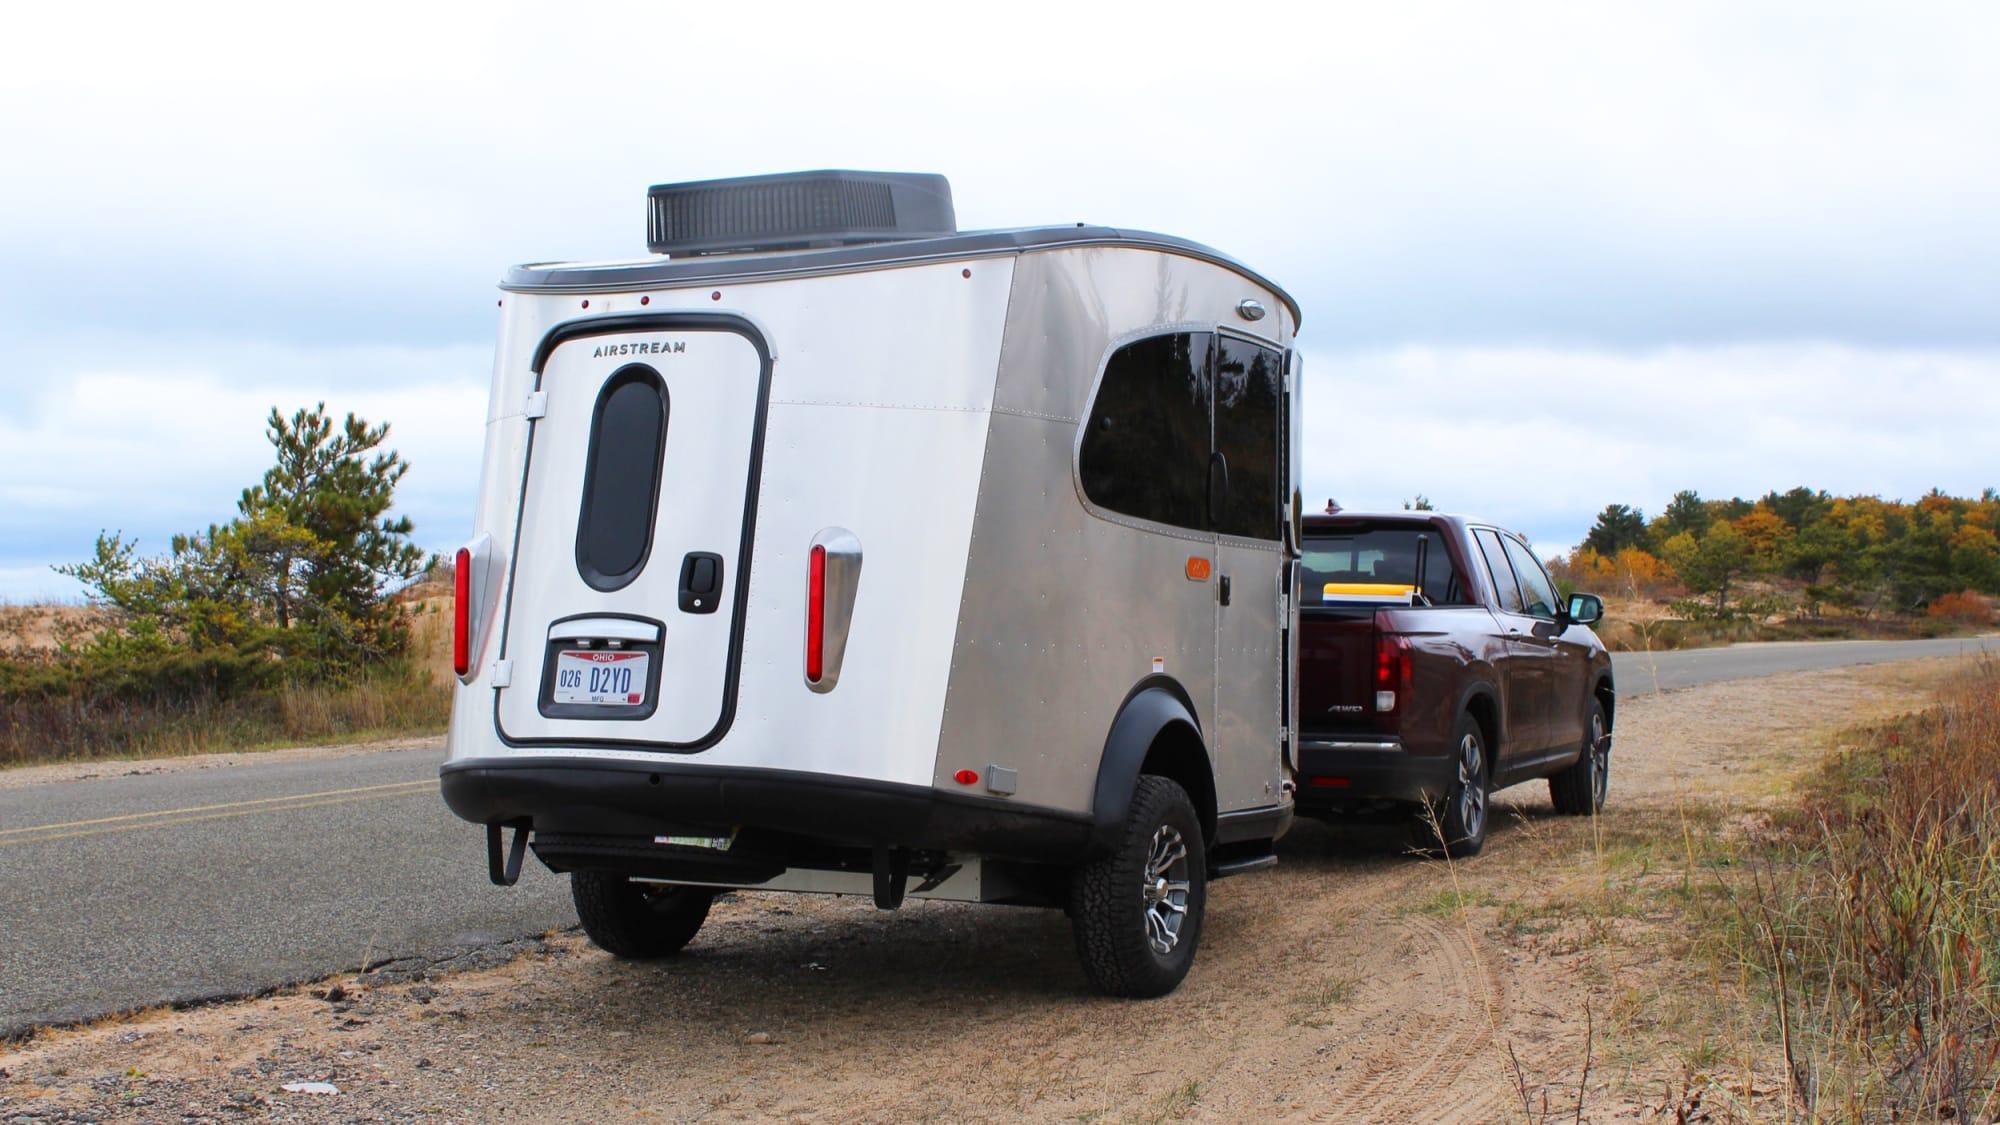 Airstream Basecamp X adventure